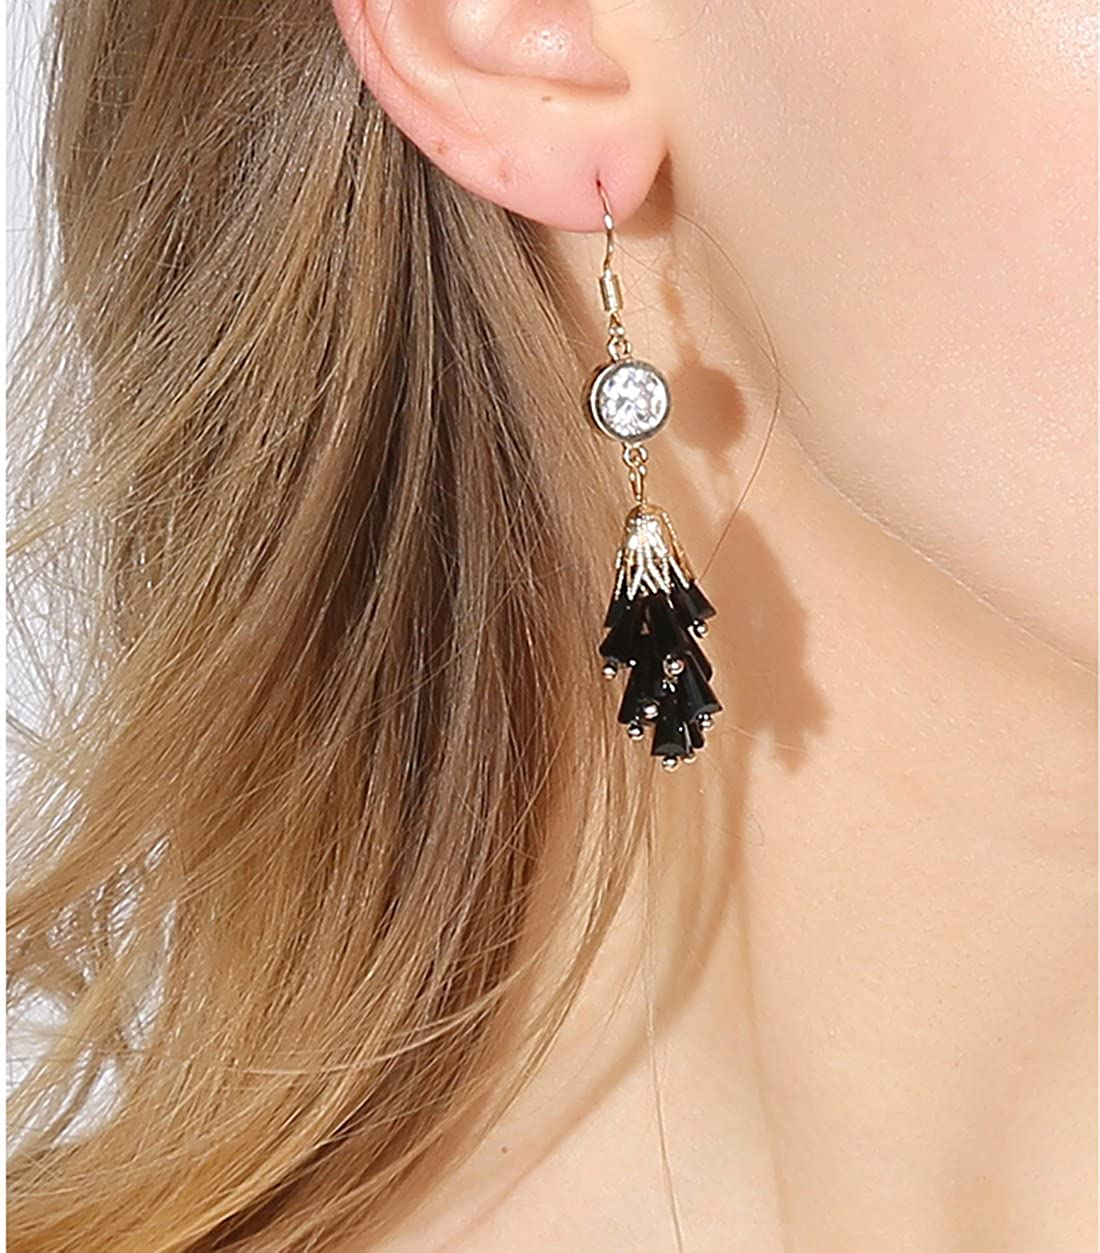 Elegant Cubic Zirconia Stud Earrings Long Crystal Drop Dangle Earrings